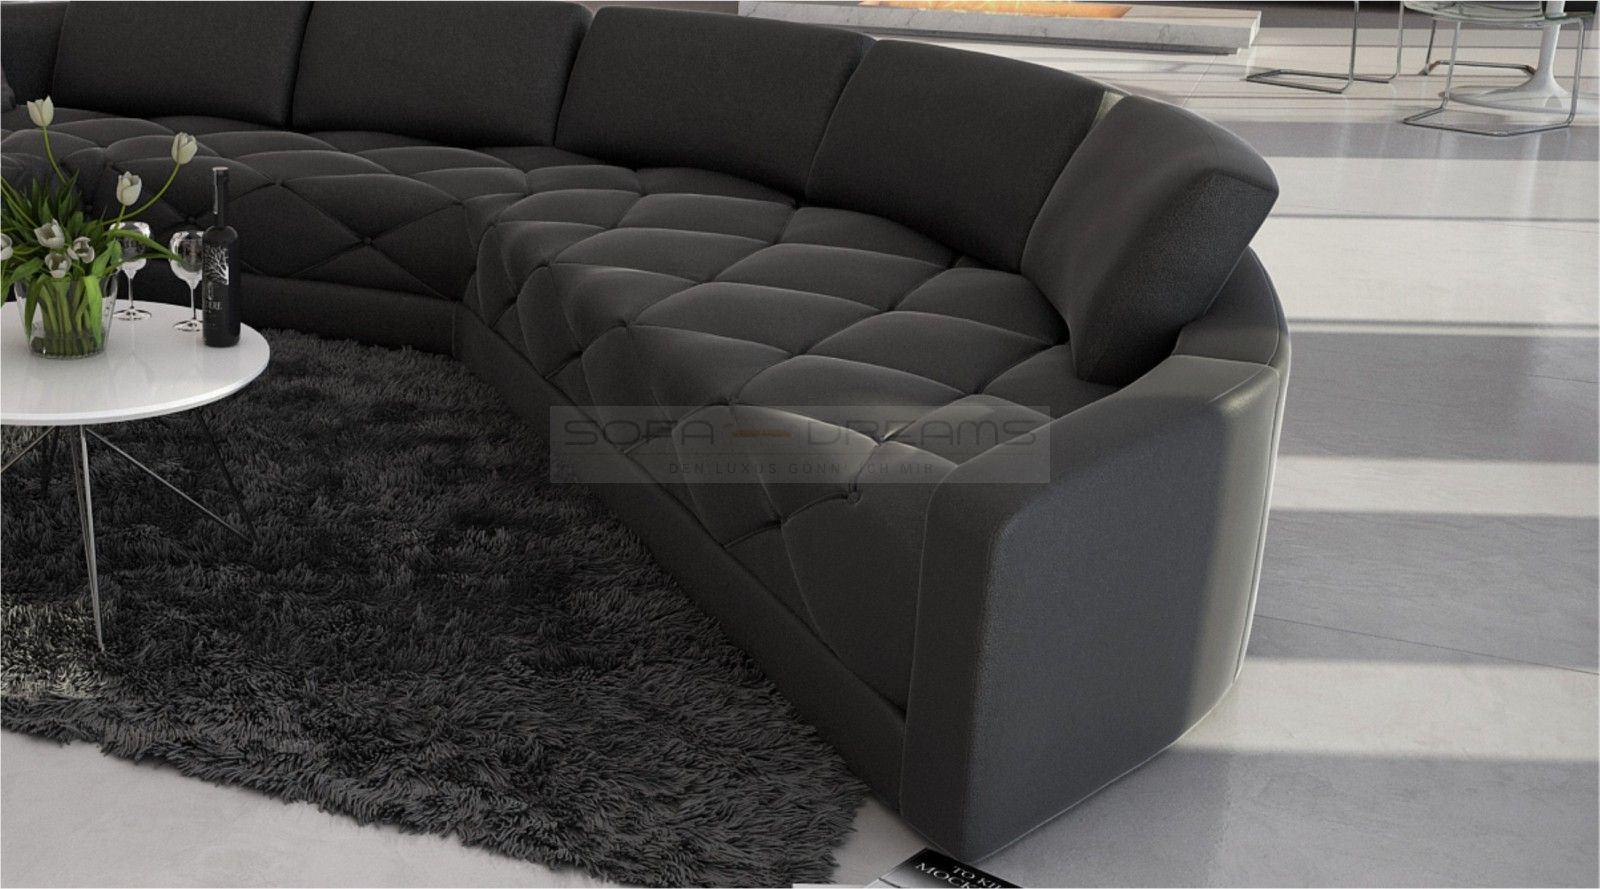 rundsofa secreto gesteppte sitzfl che designersofa. Black Bedroom Furniture Sets. Home Design Ideas